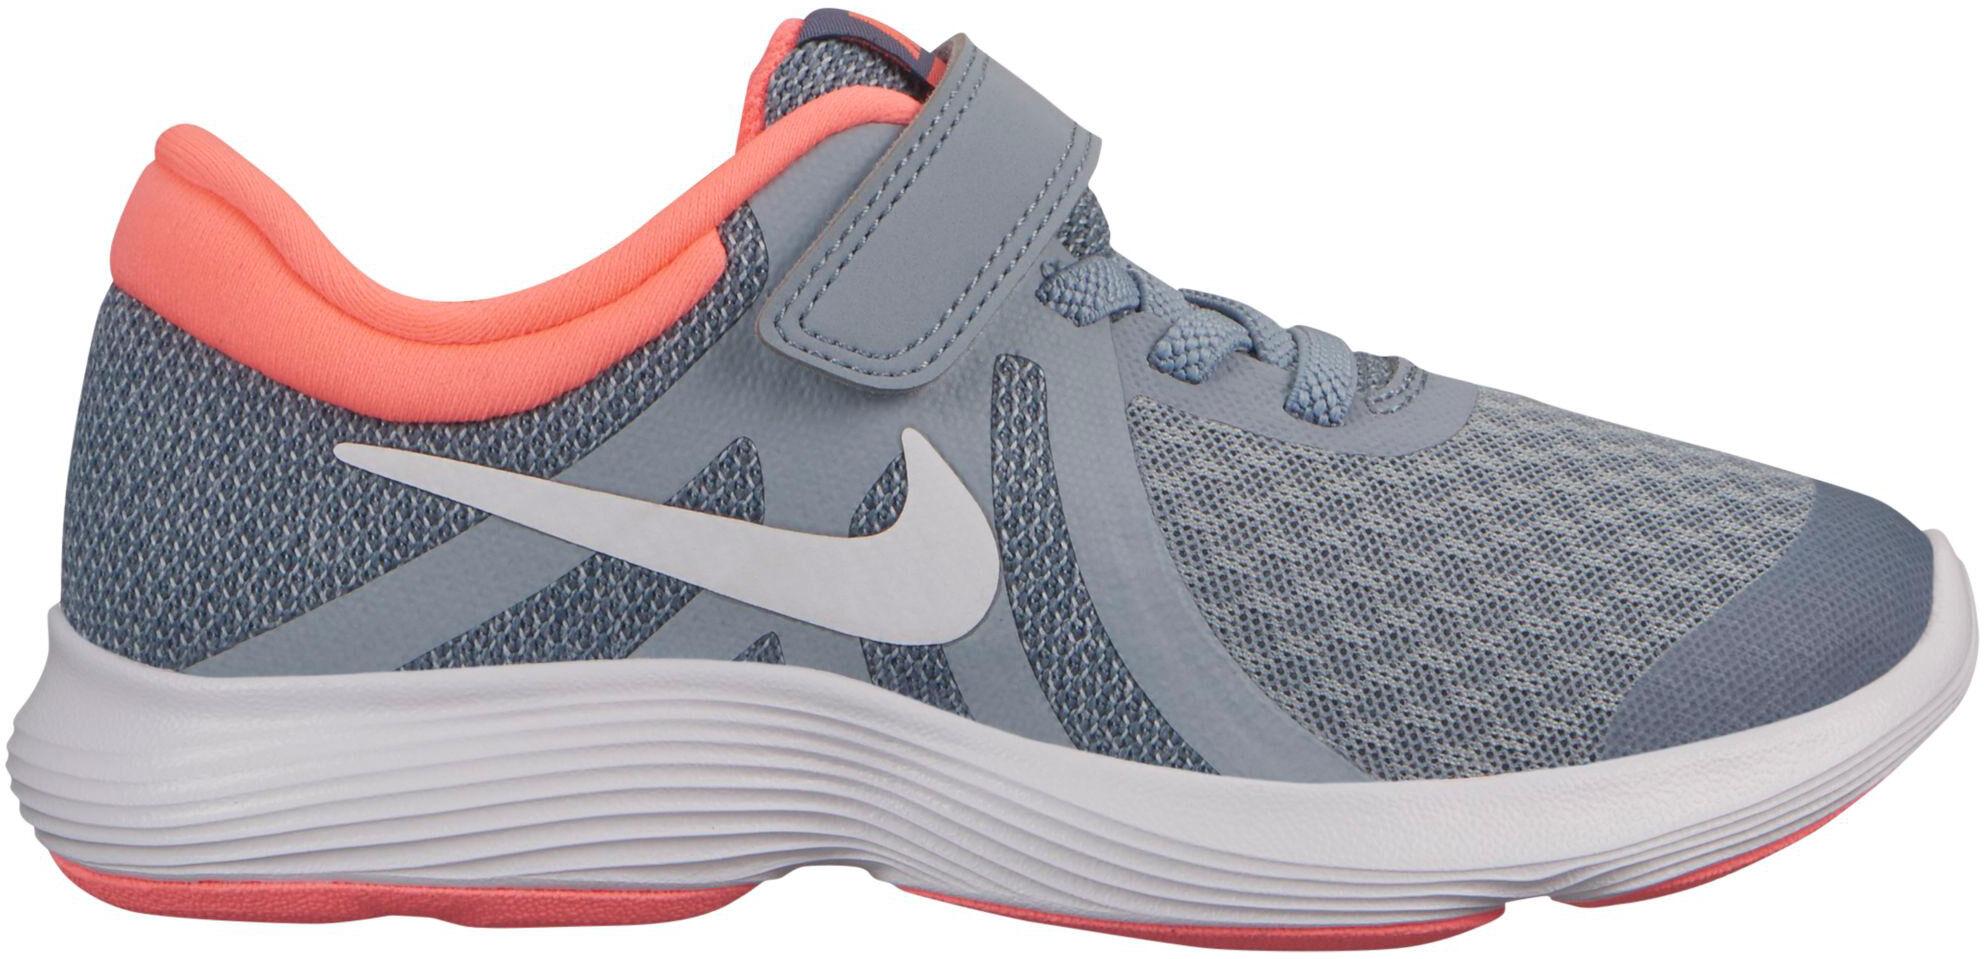 Nike - Zapatilla REVOLUTION 4 (PSV) - Unisex - Zapatillas Running - Gris -  27dot5